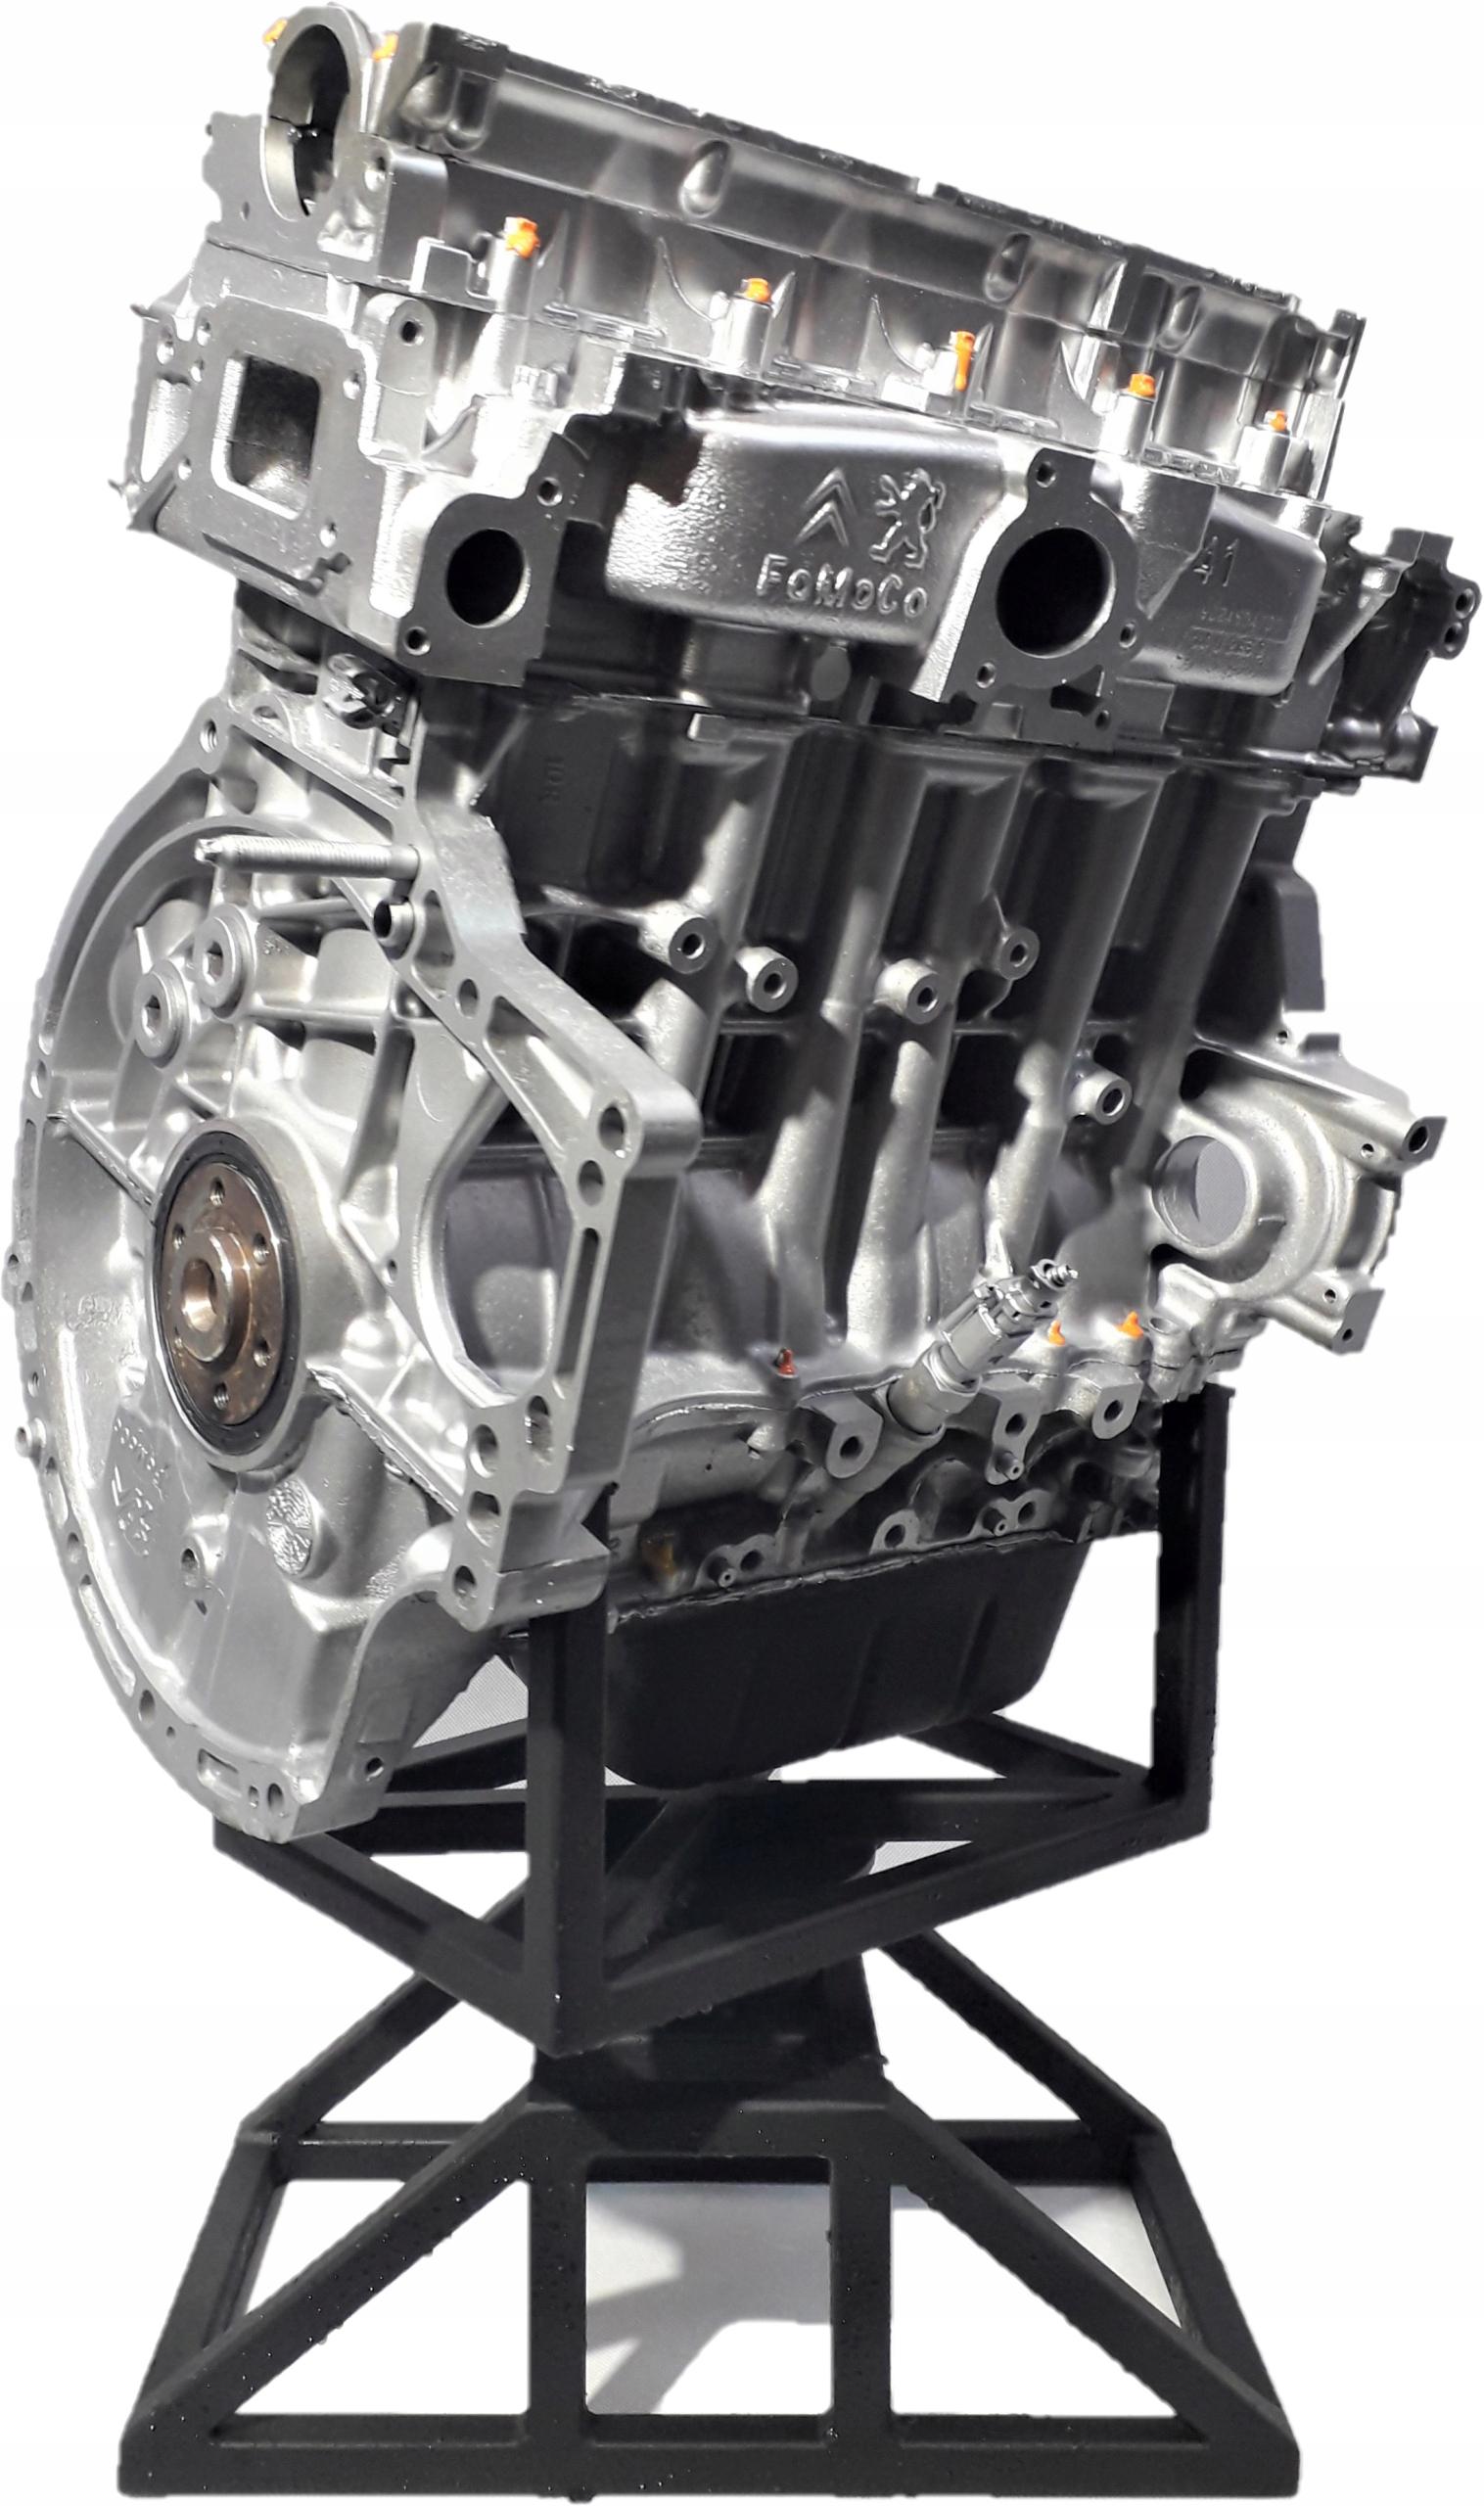 двигатель citroen peugeot 16 hdi 9h05+regenerowany